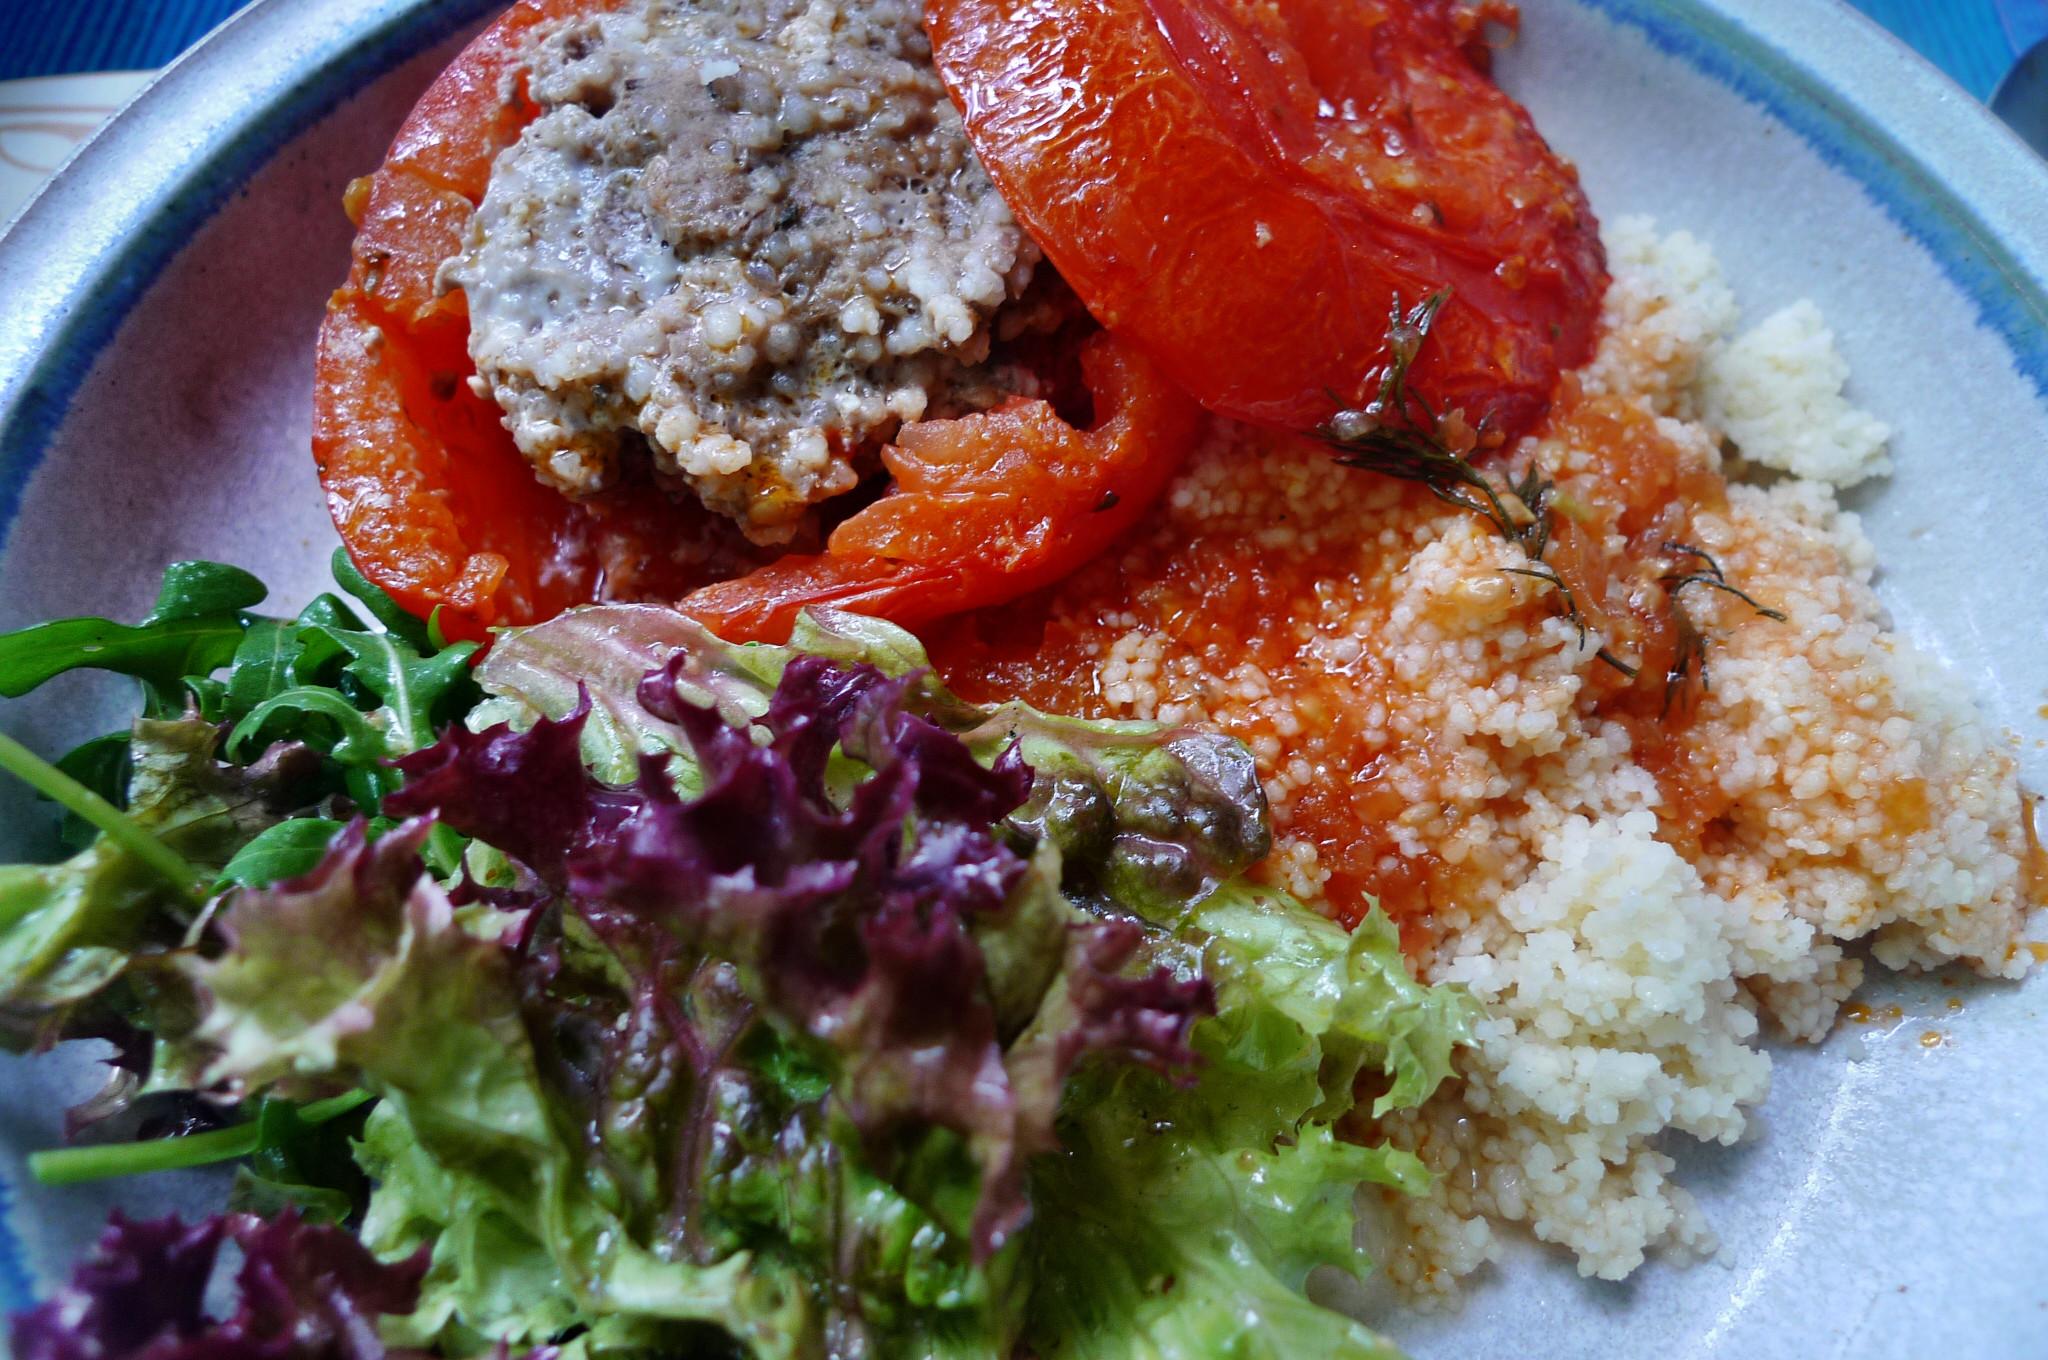 Fefüllte Tomaten,Couscous - 22.5.15   (11)